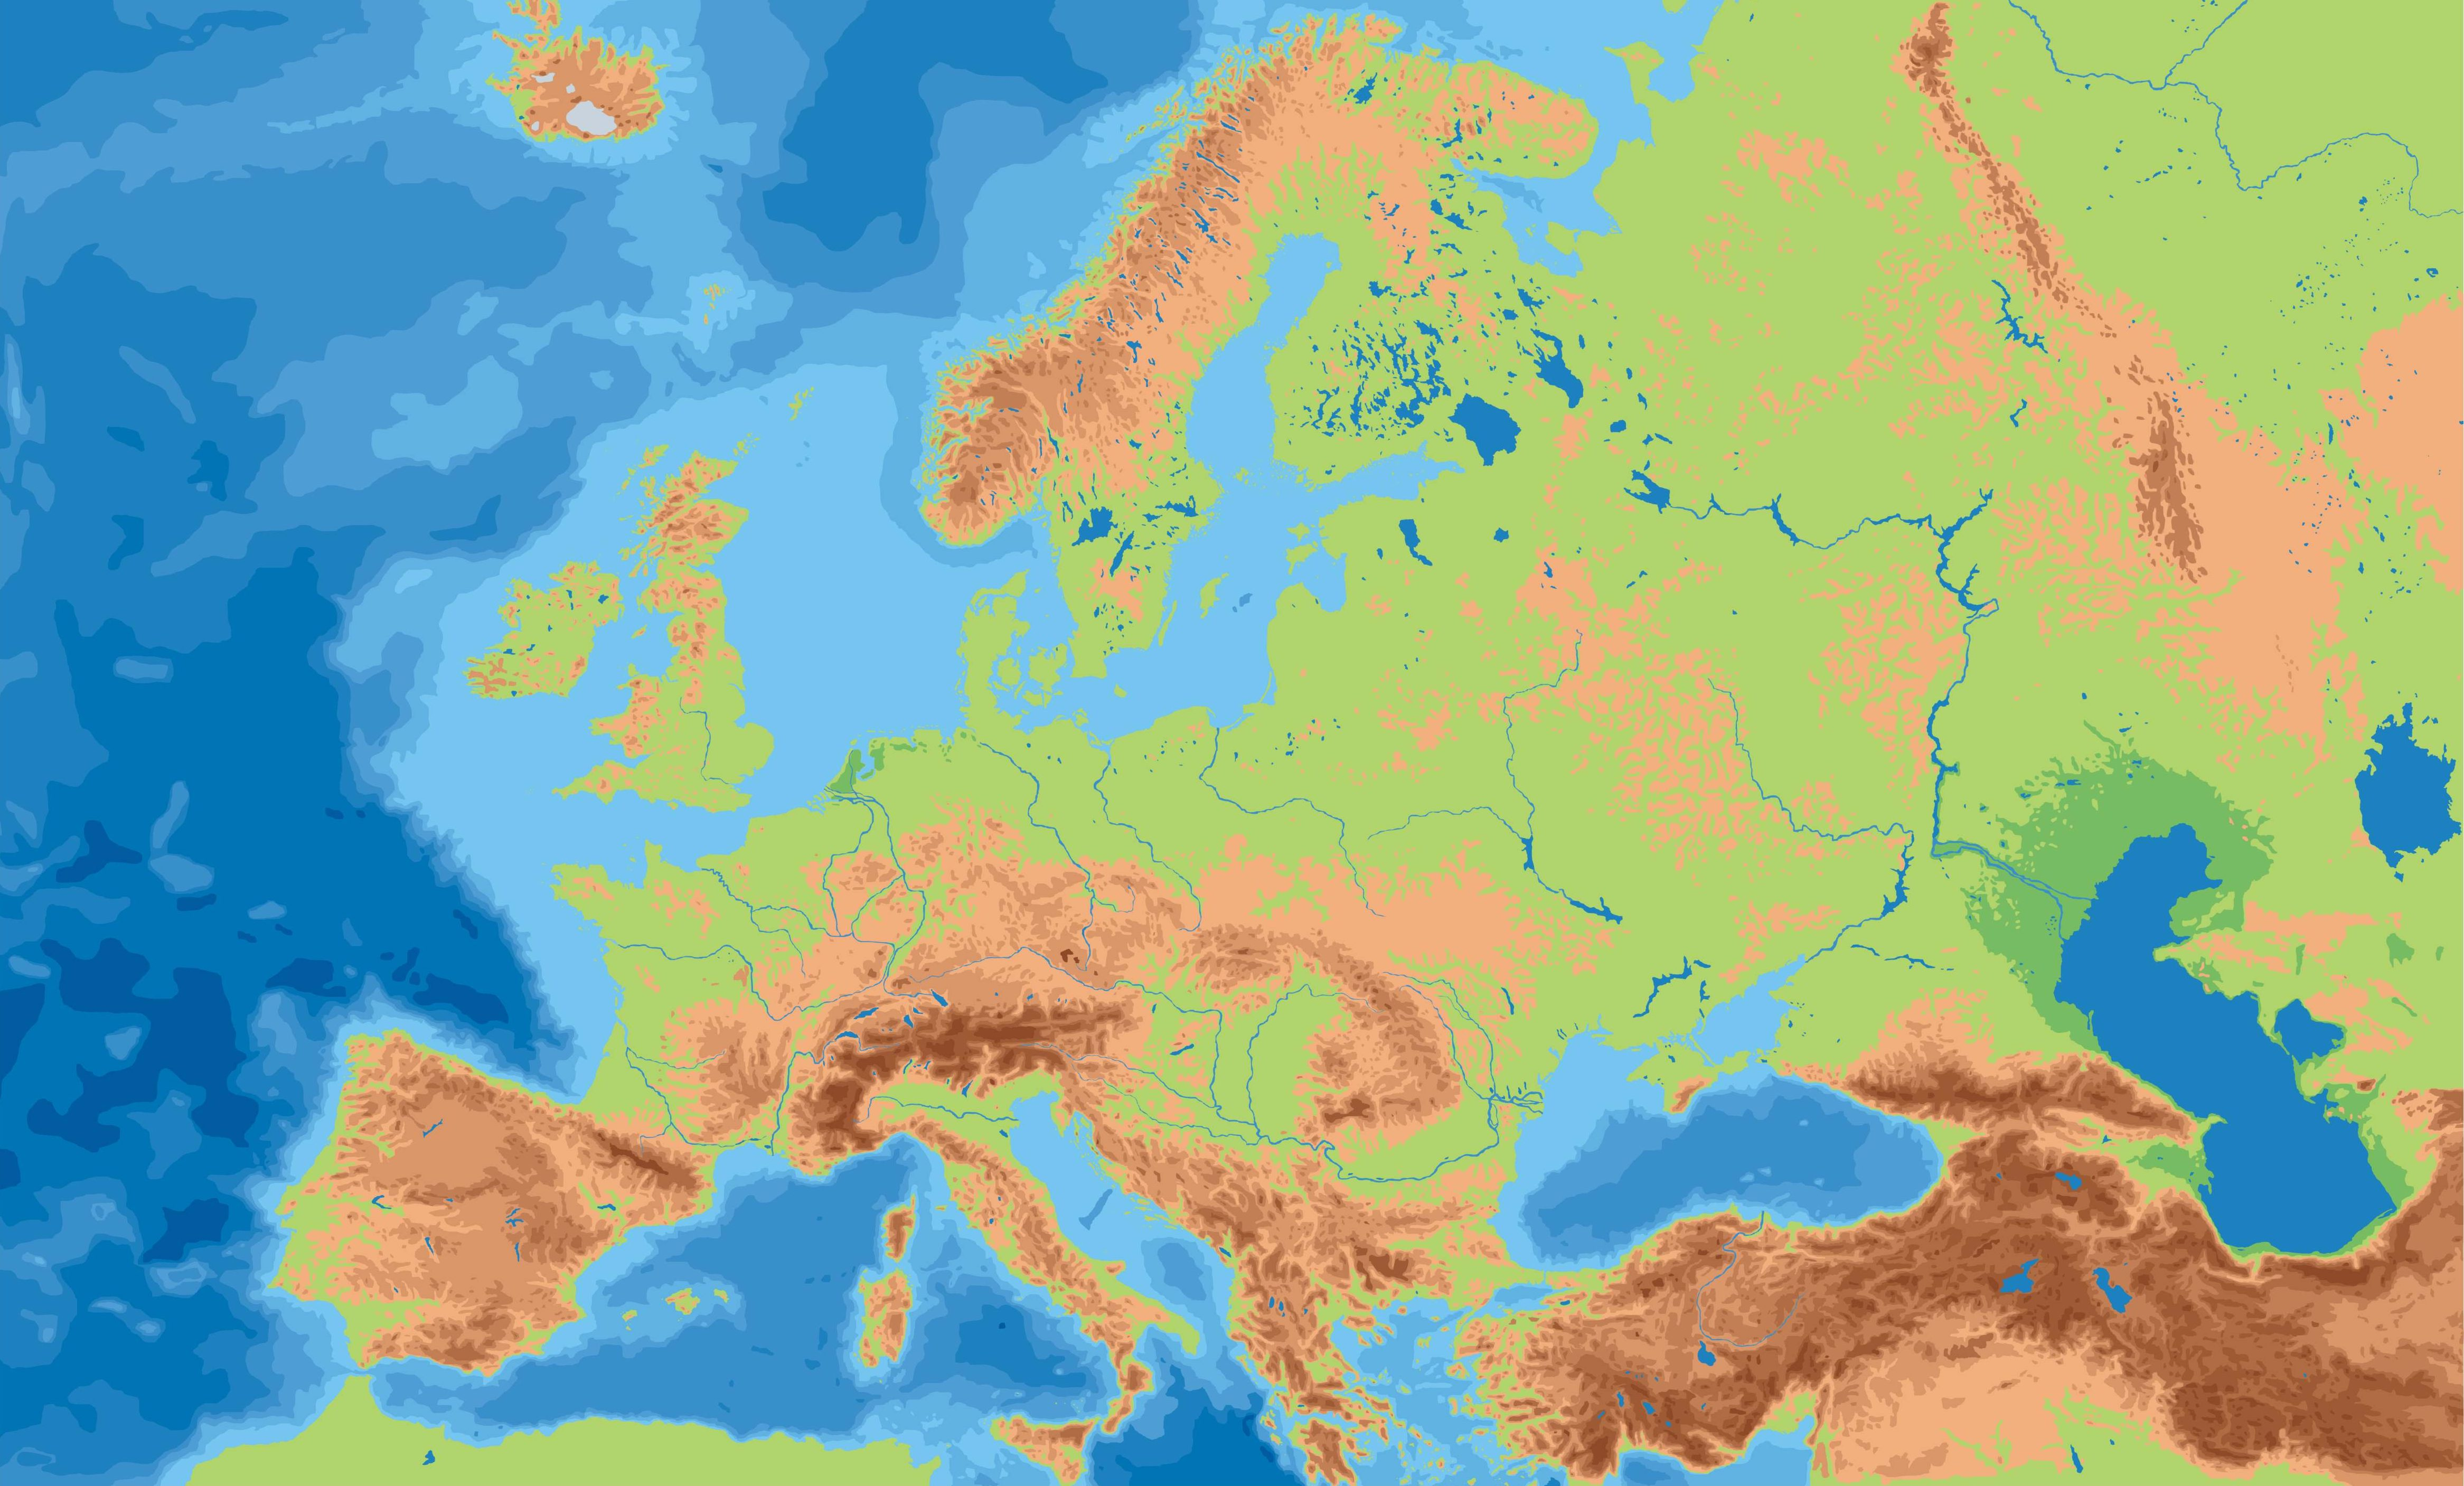 Landkarte Europa - Landkarten download -> Europakarte / Europa ...